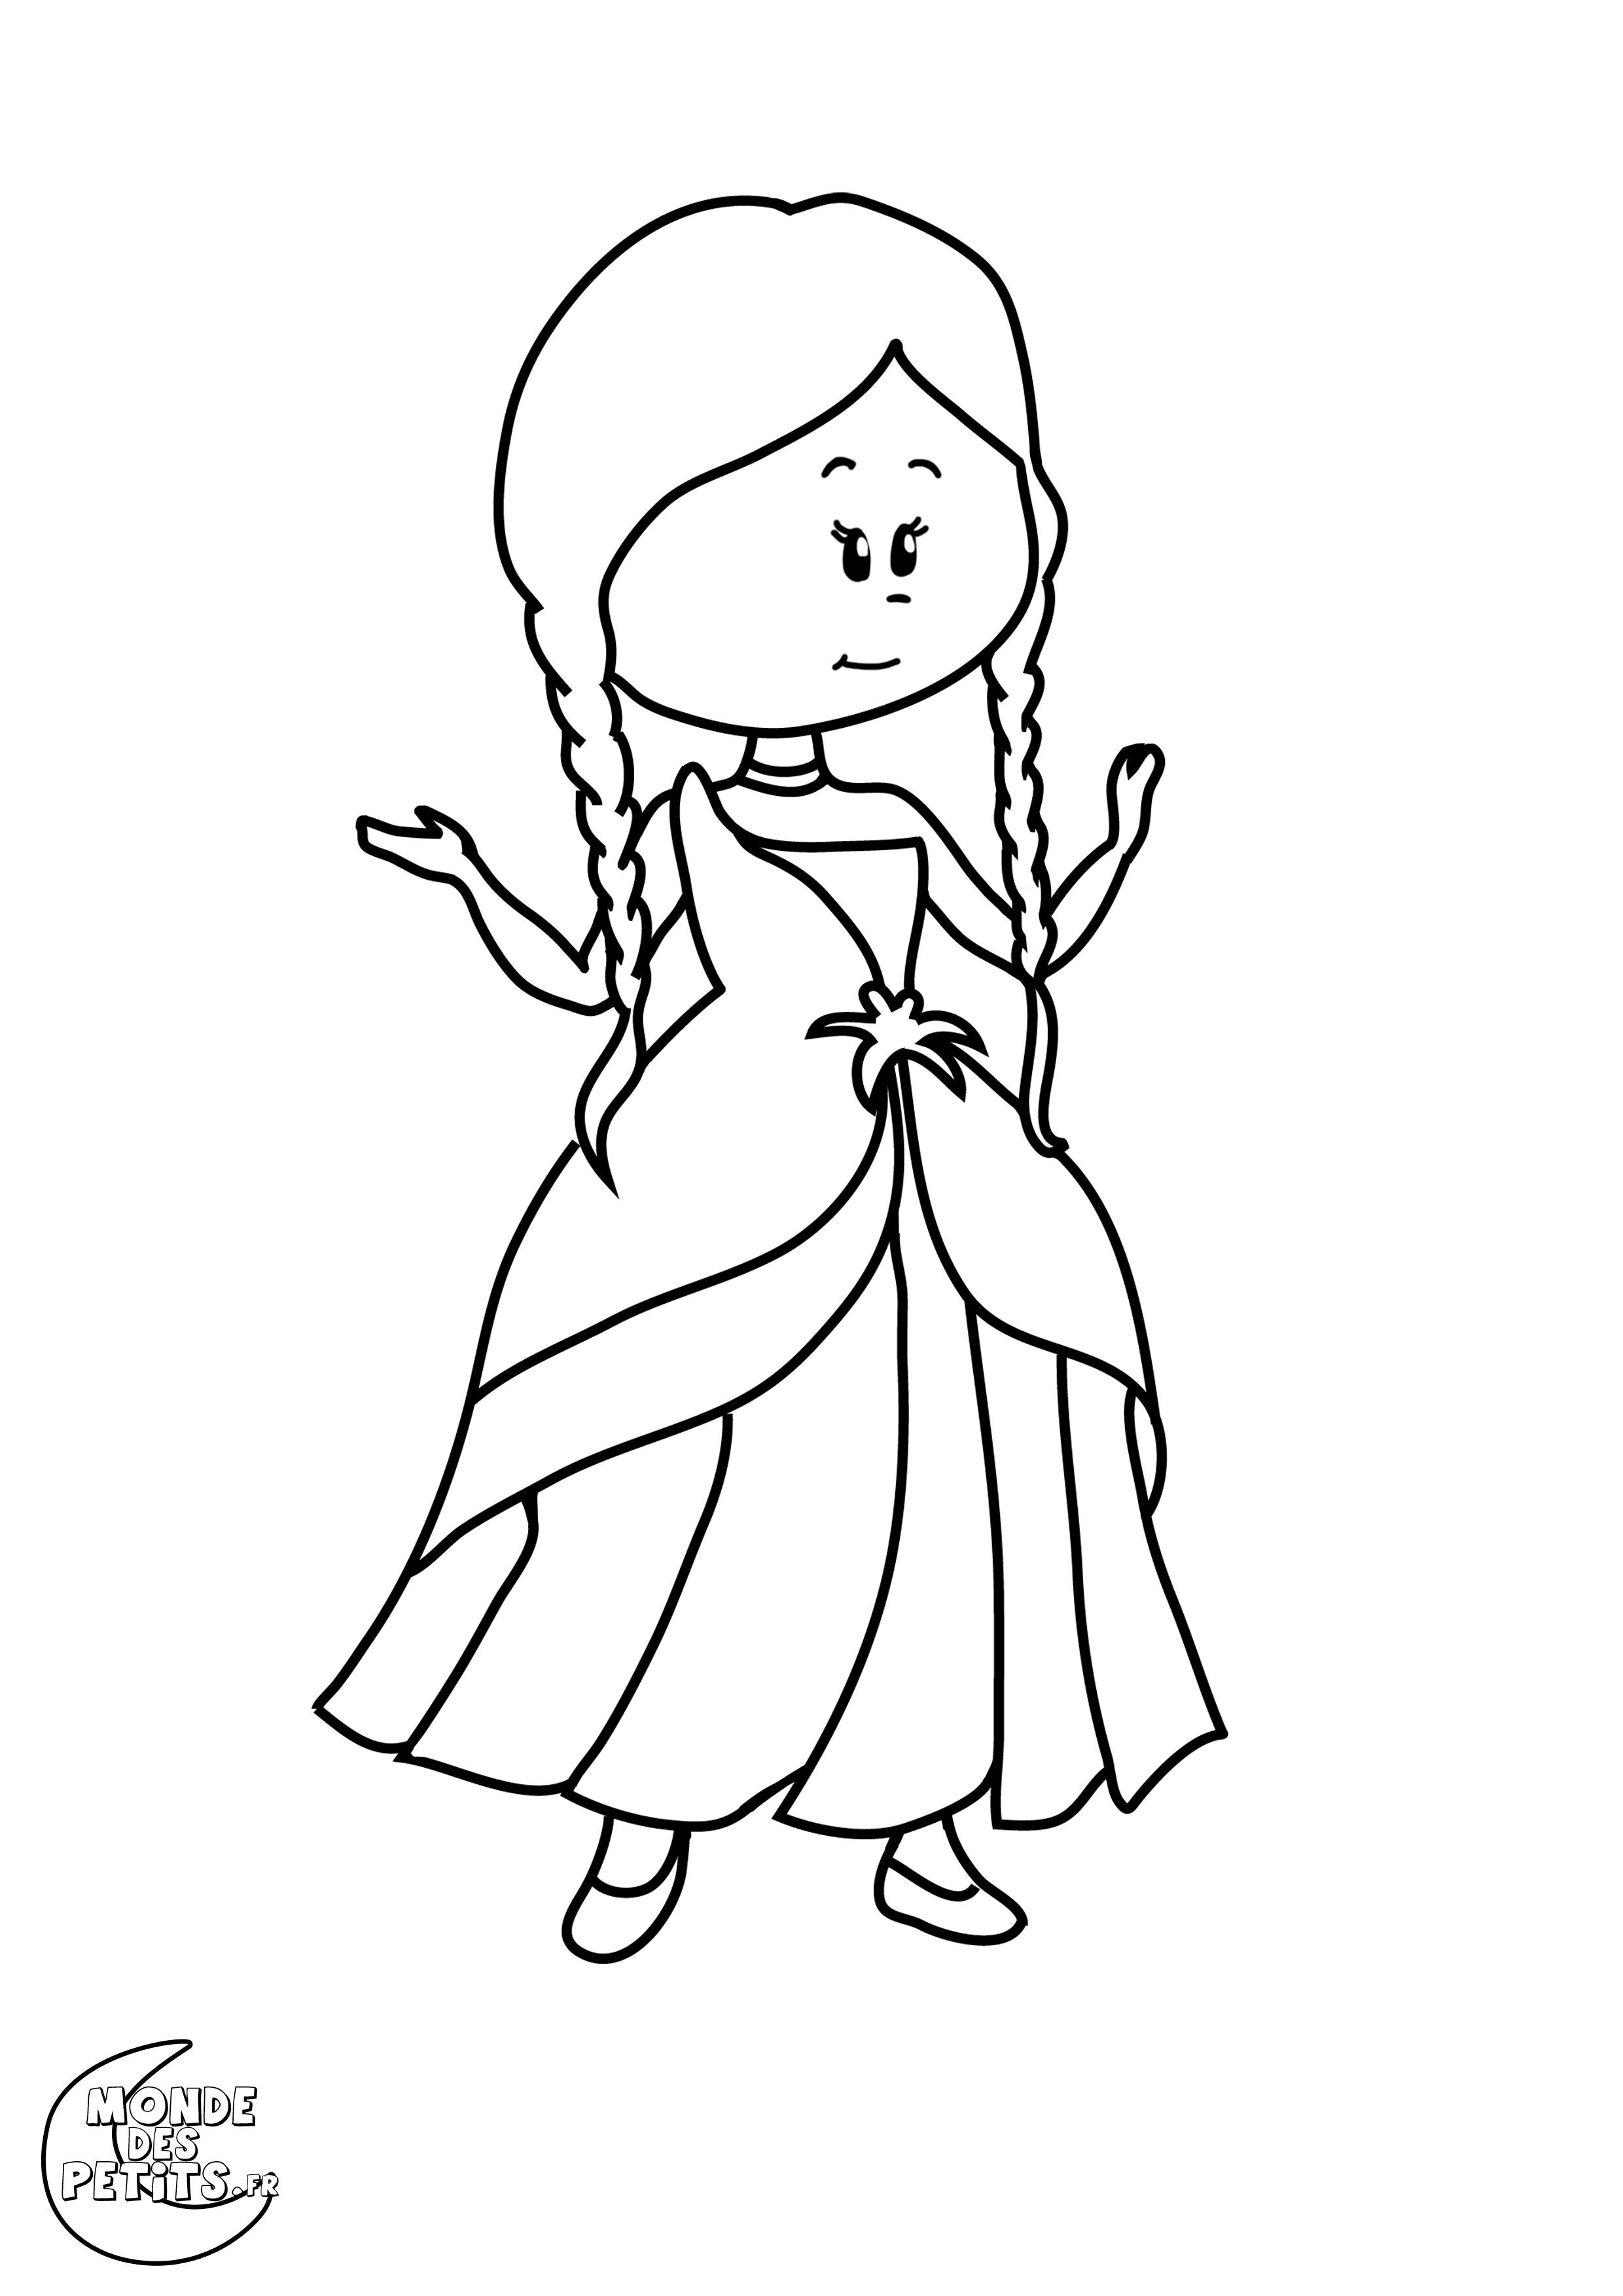 Impressionnant Dessin A Colorier Princesse Blanche Neige